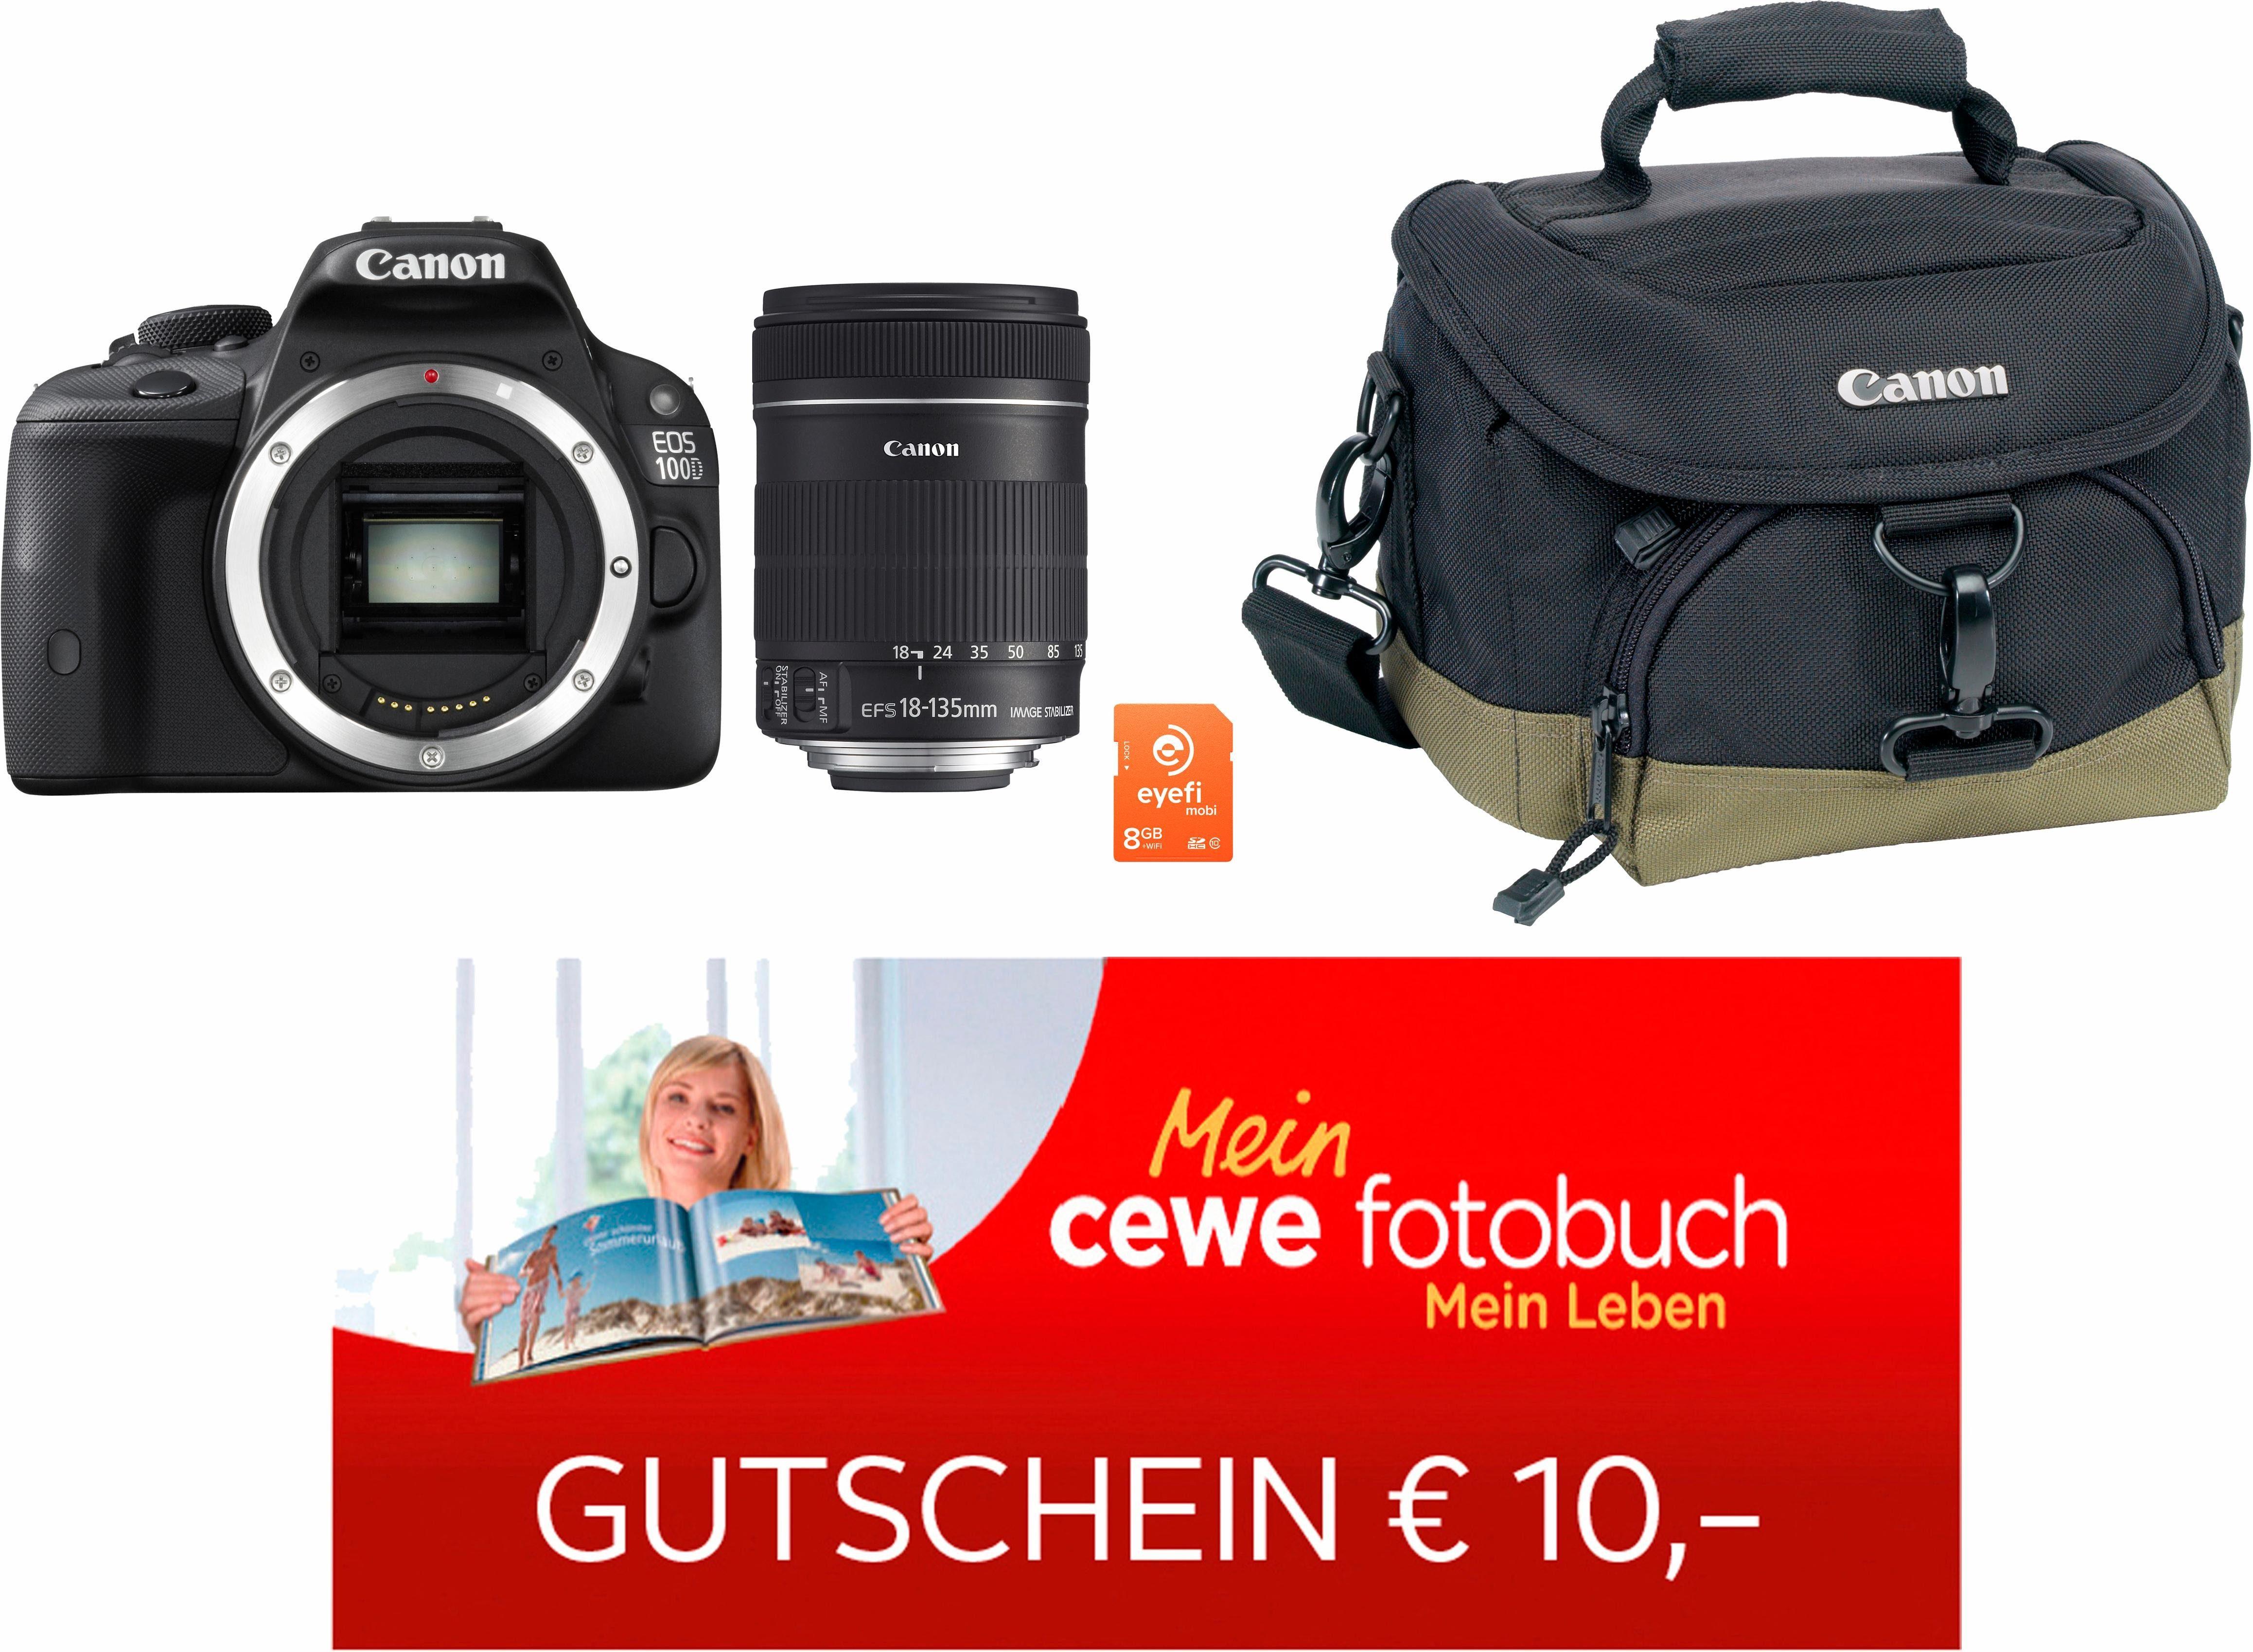 Canon EOS 100D Kit Spiegelreflex Kamera mit 18-135 Zoom-Objektiv inkl. Tasche & 8 GB Eye-Fi Karte